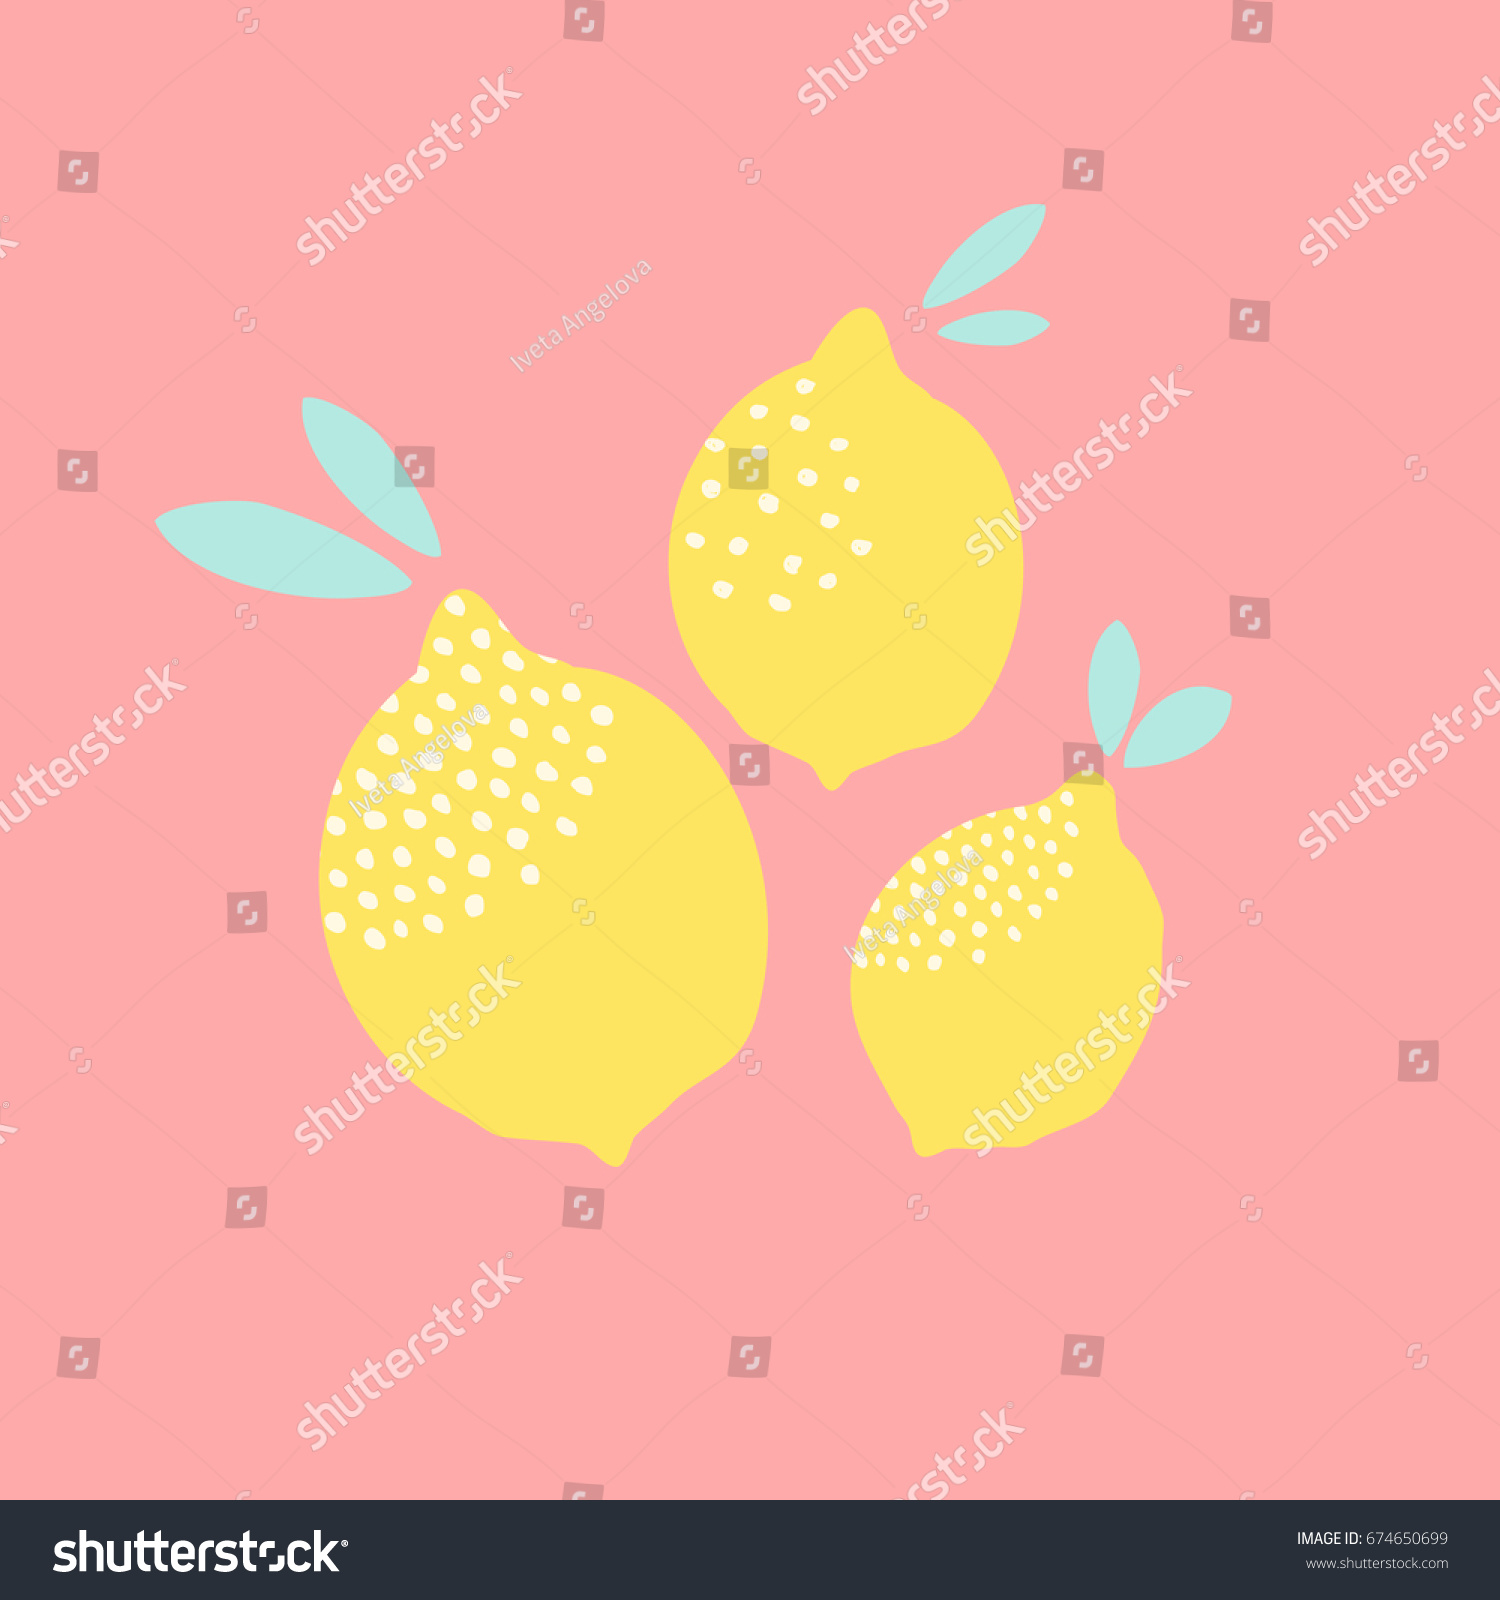 Cute Card Design Lemons Yellow On Stock Vector 674650699 - Shutterstock